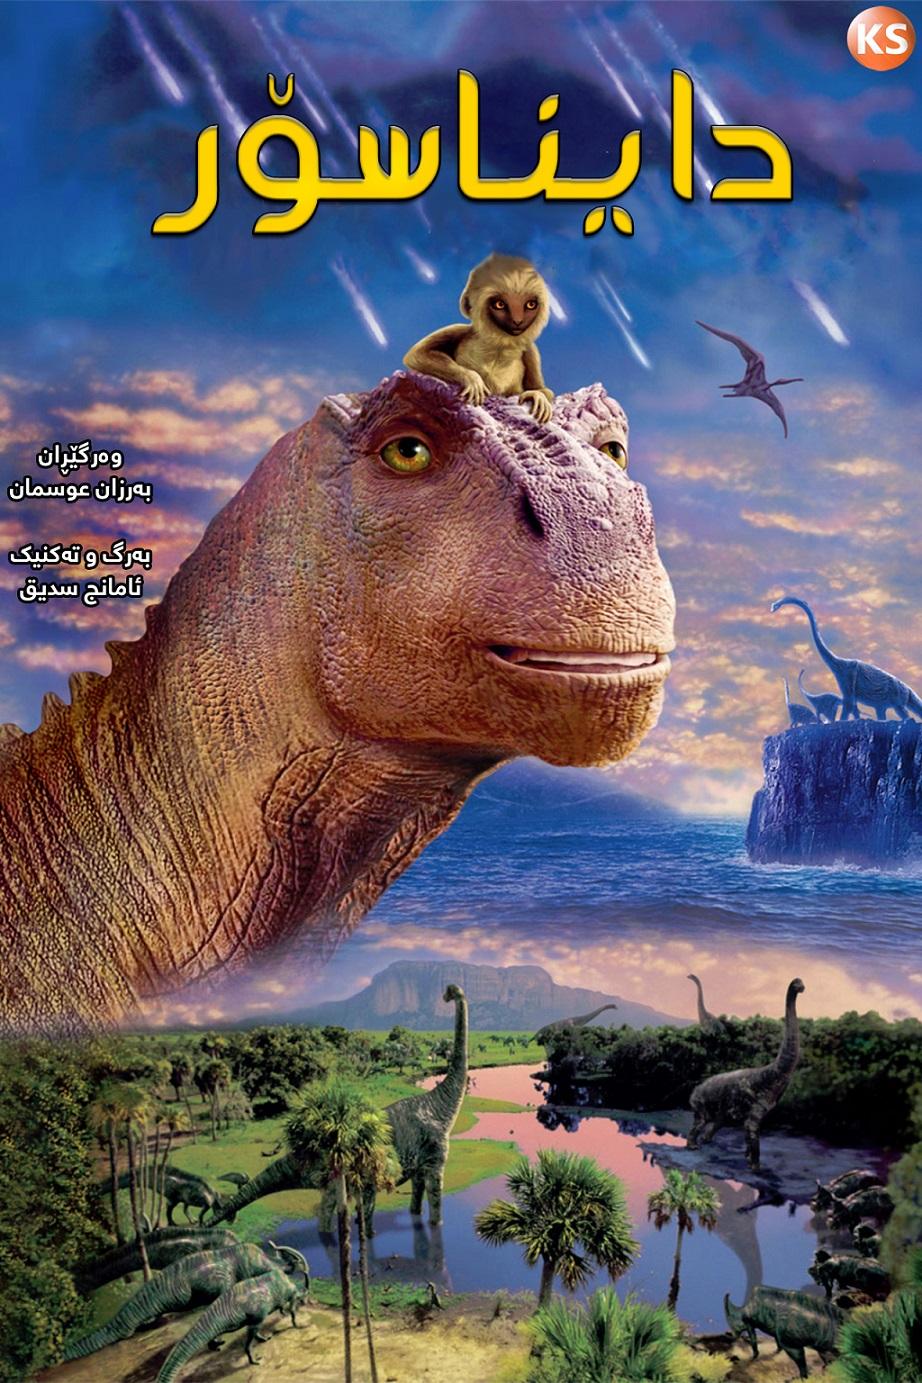 Dinosaur kurdish poster